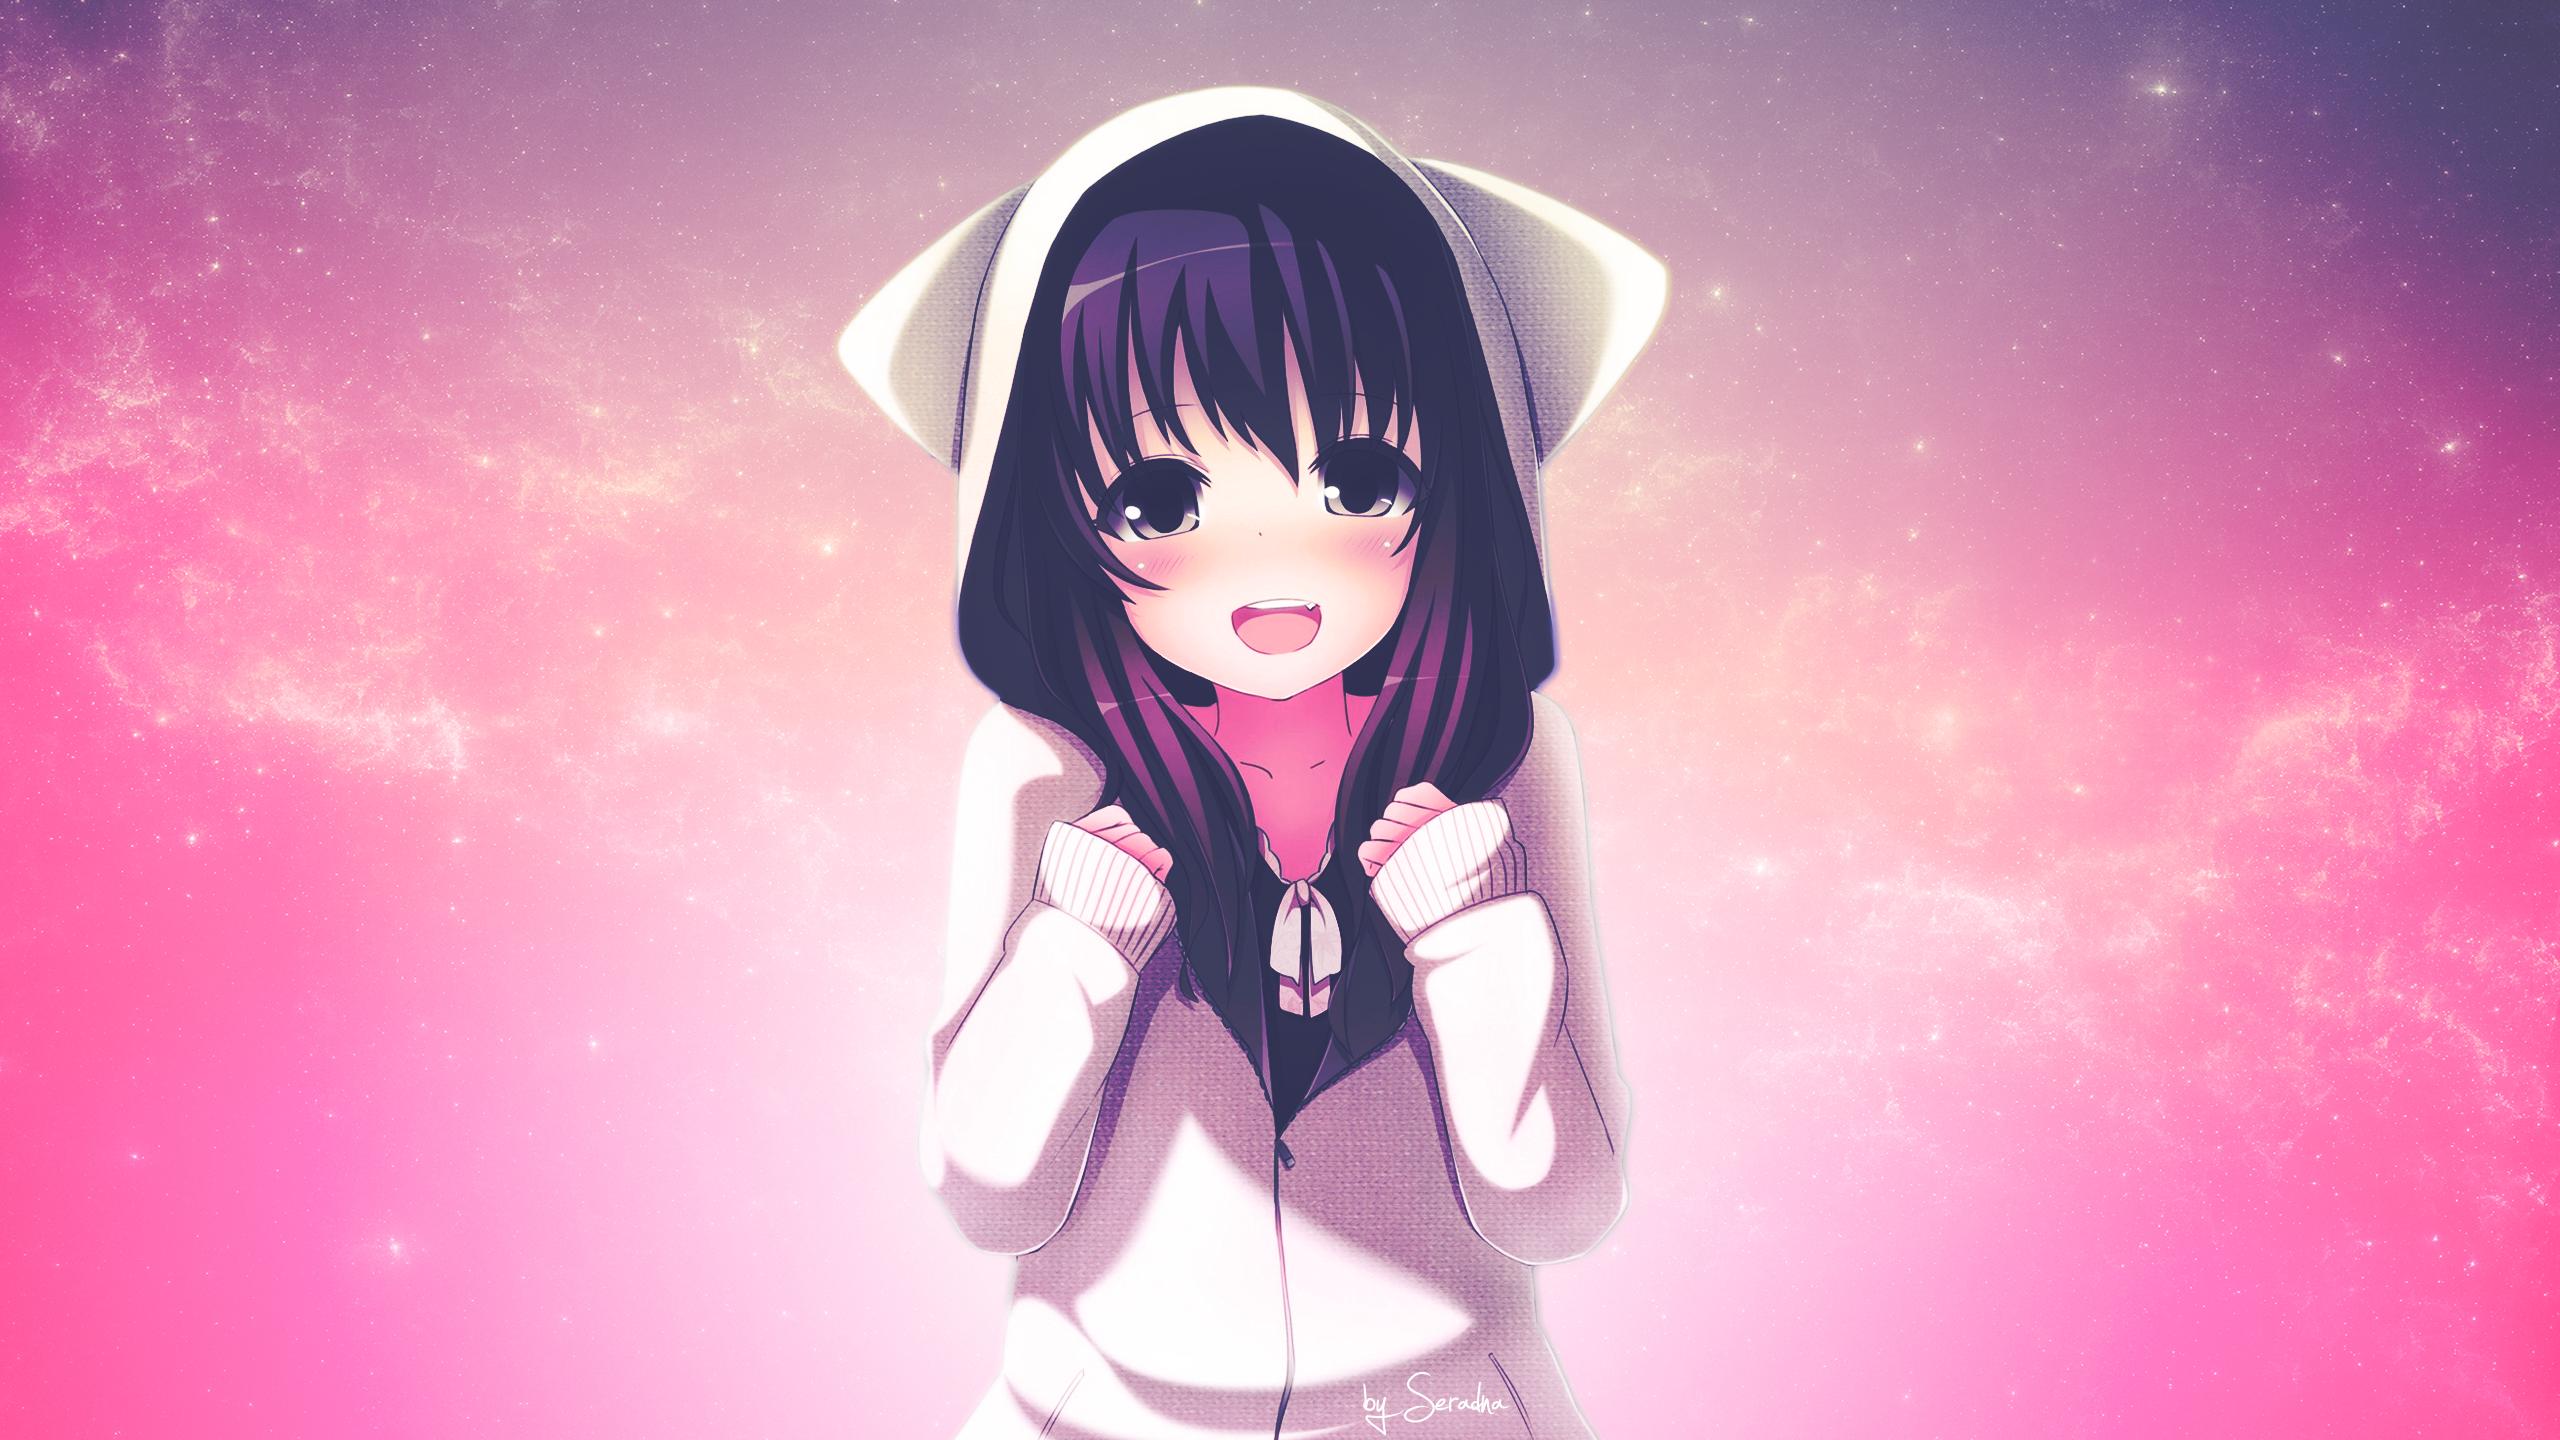 Kawaii Anime images Amuchan pink wallpaper HD wallpaper and